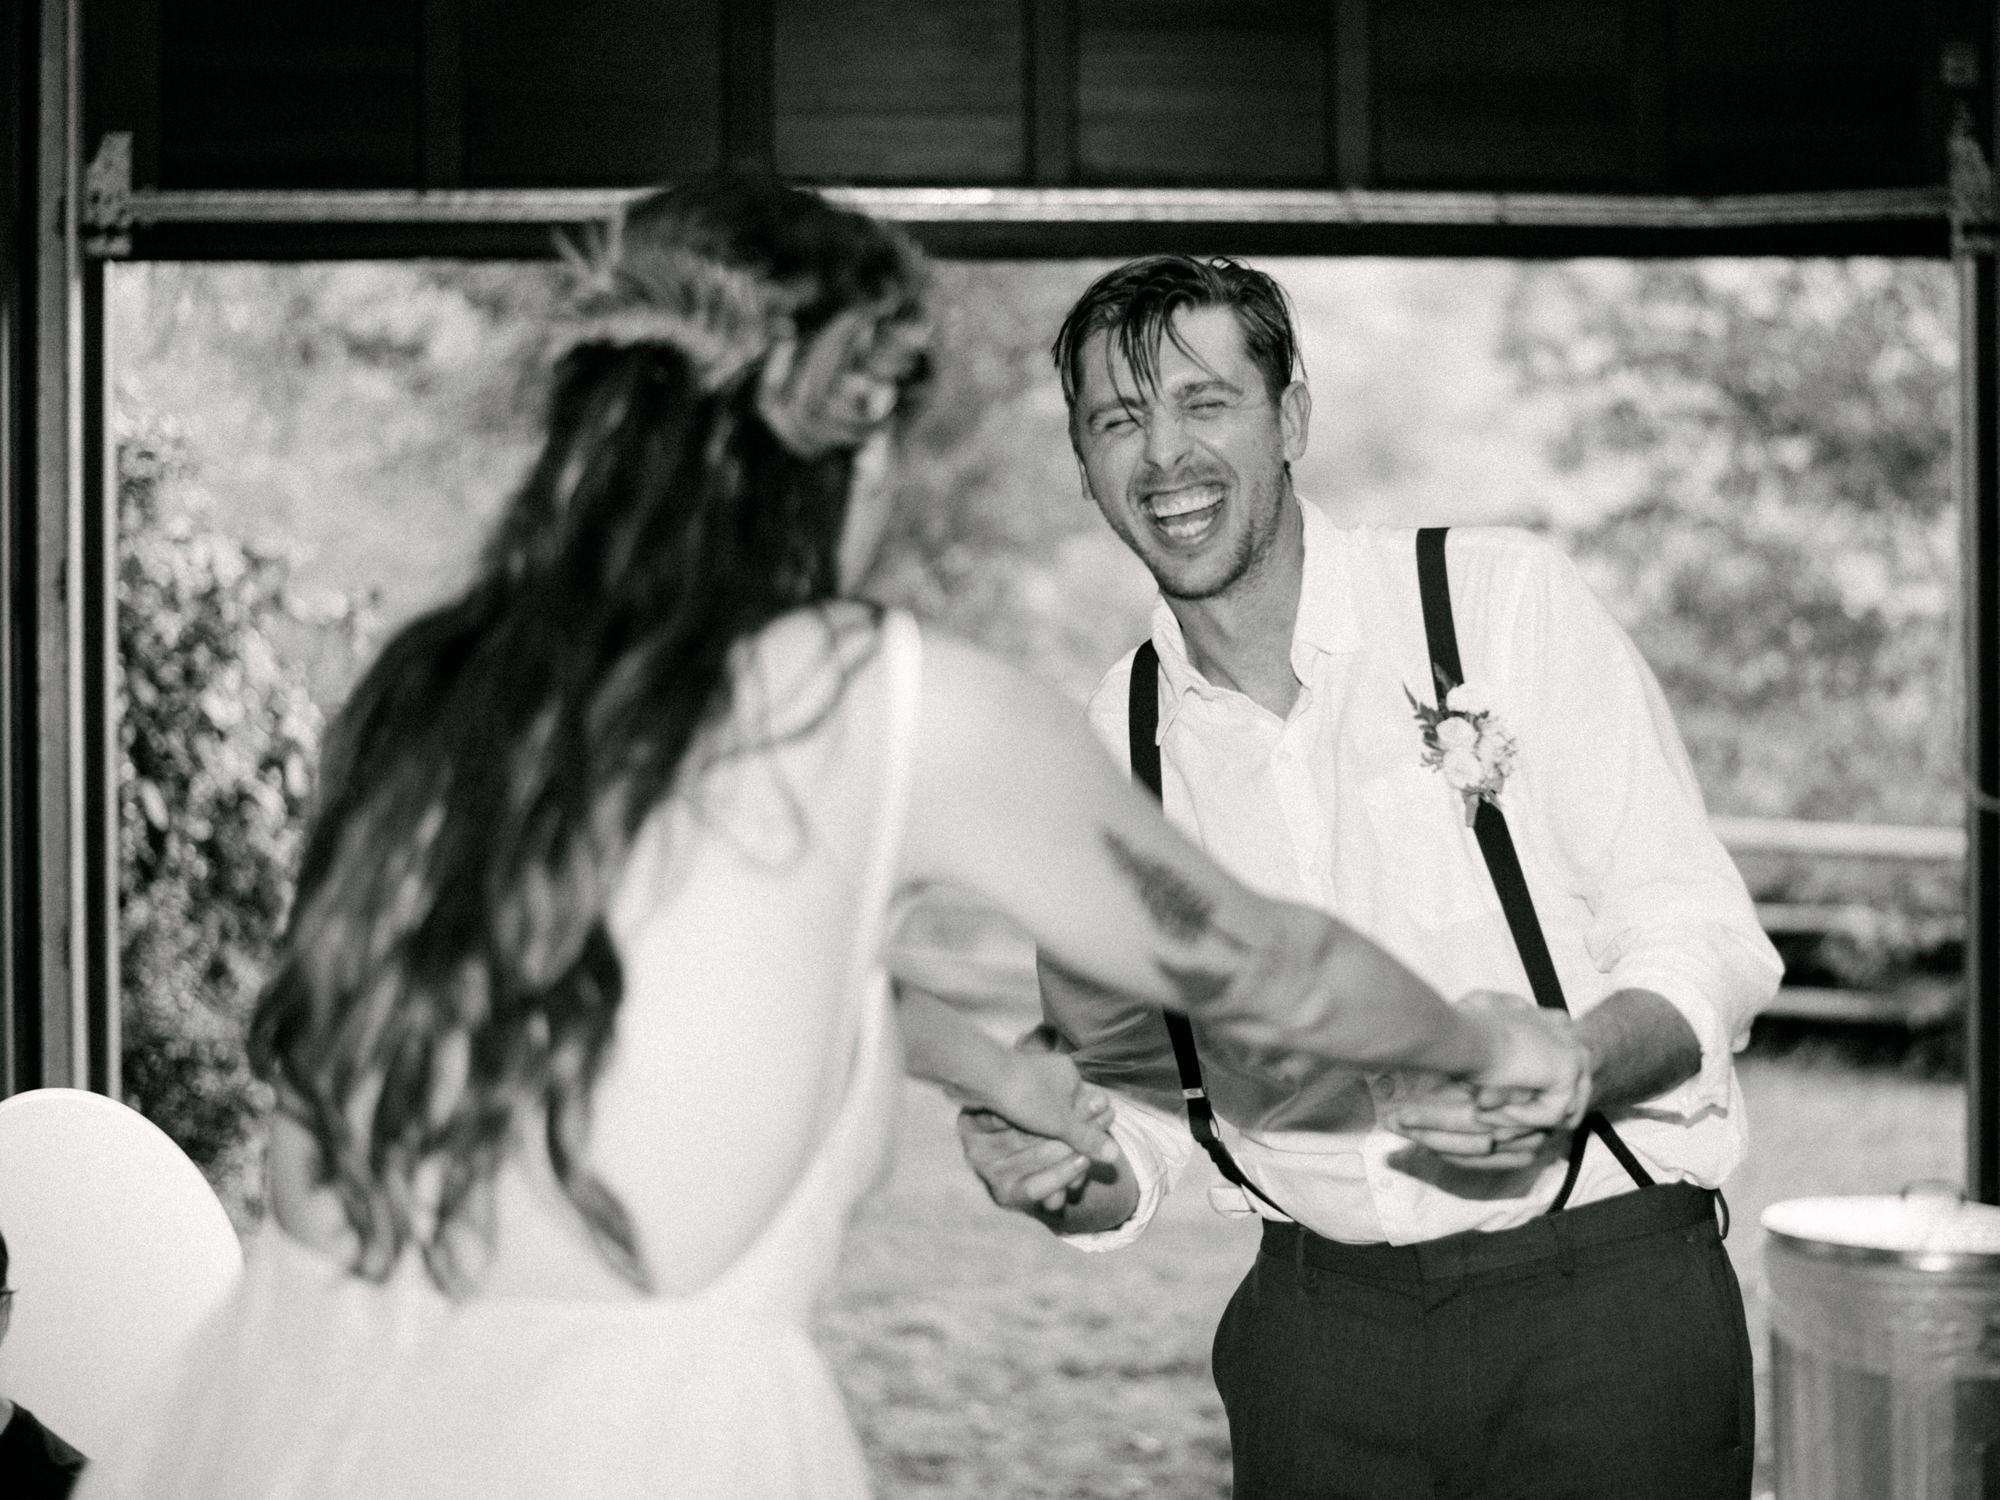 Couple dancing at wedding reception